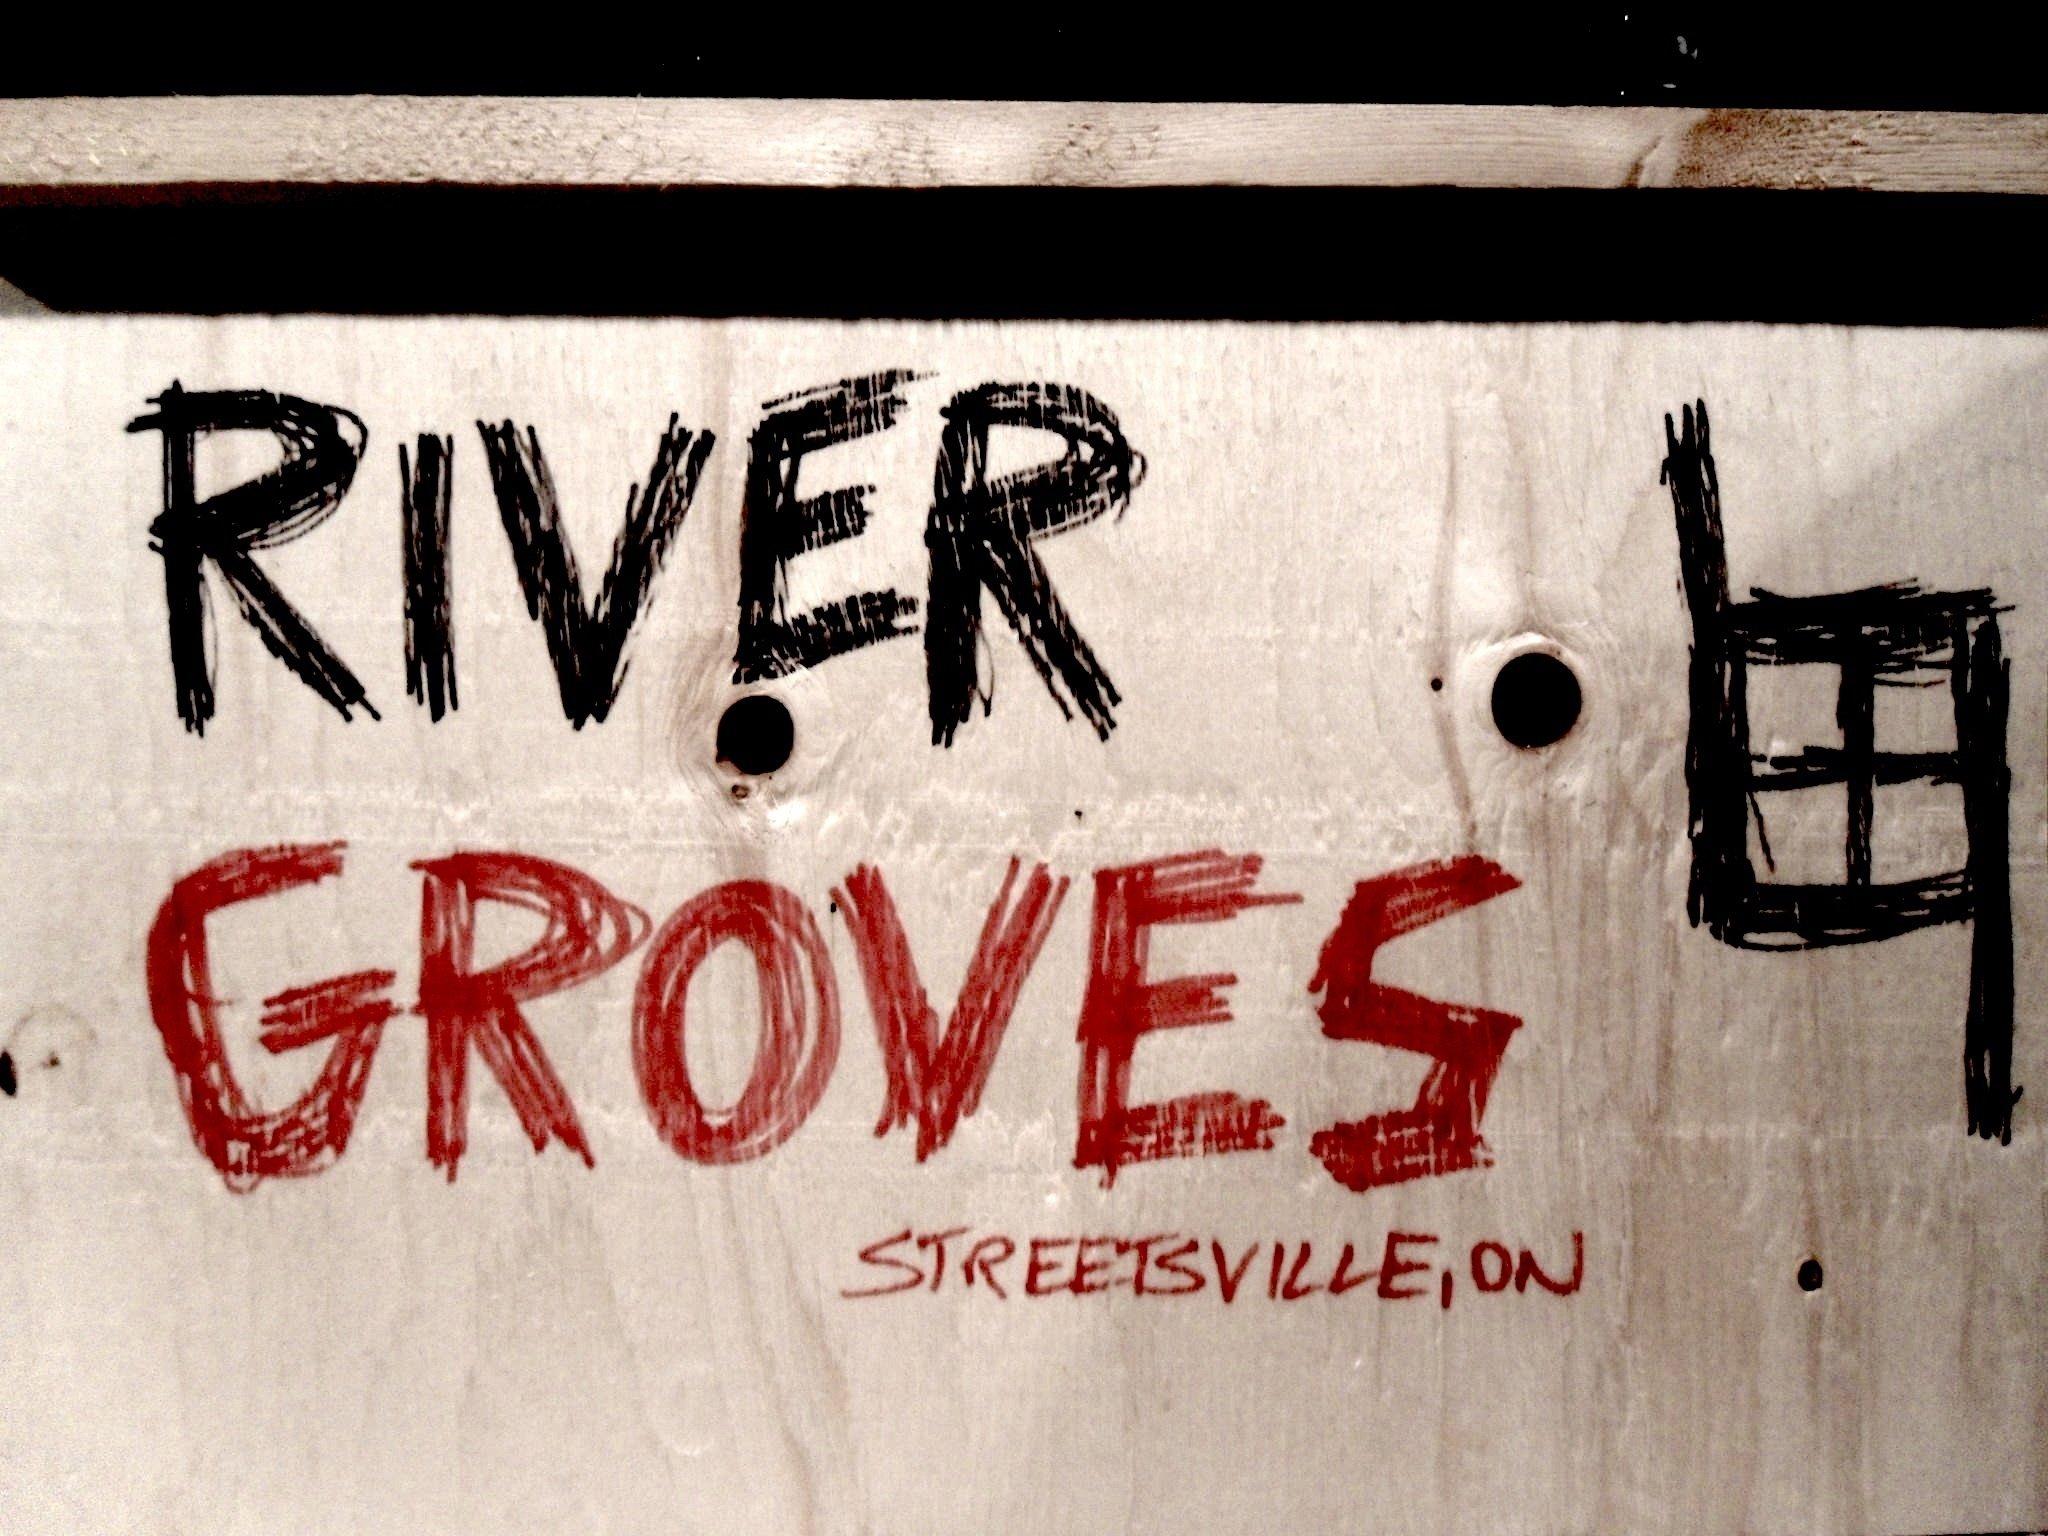 Image for River Groves